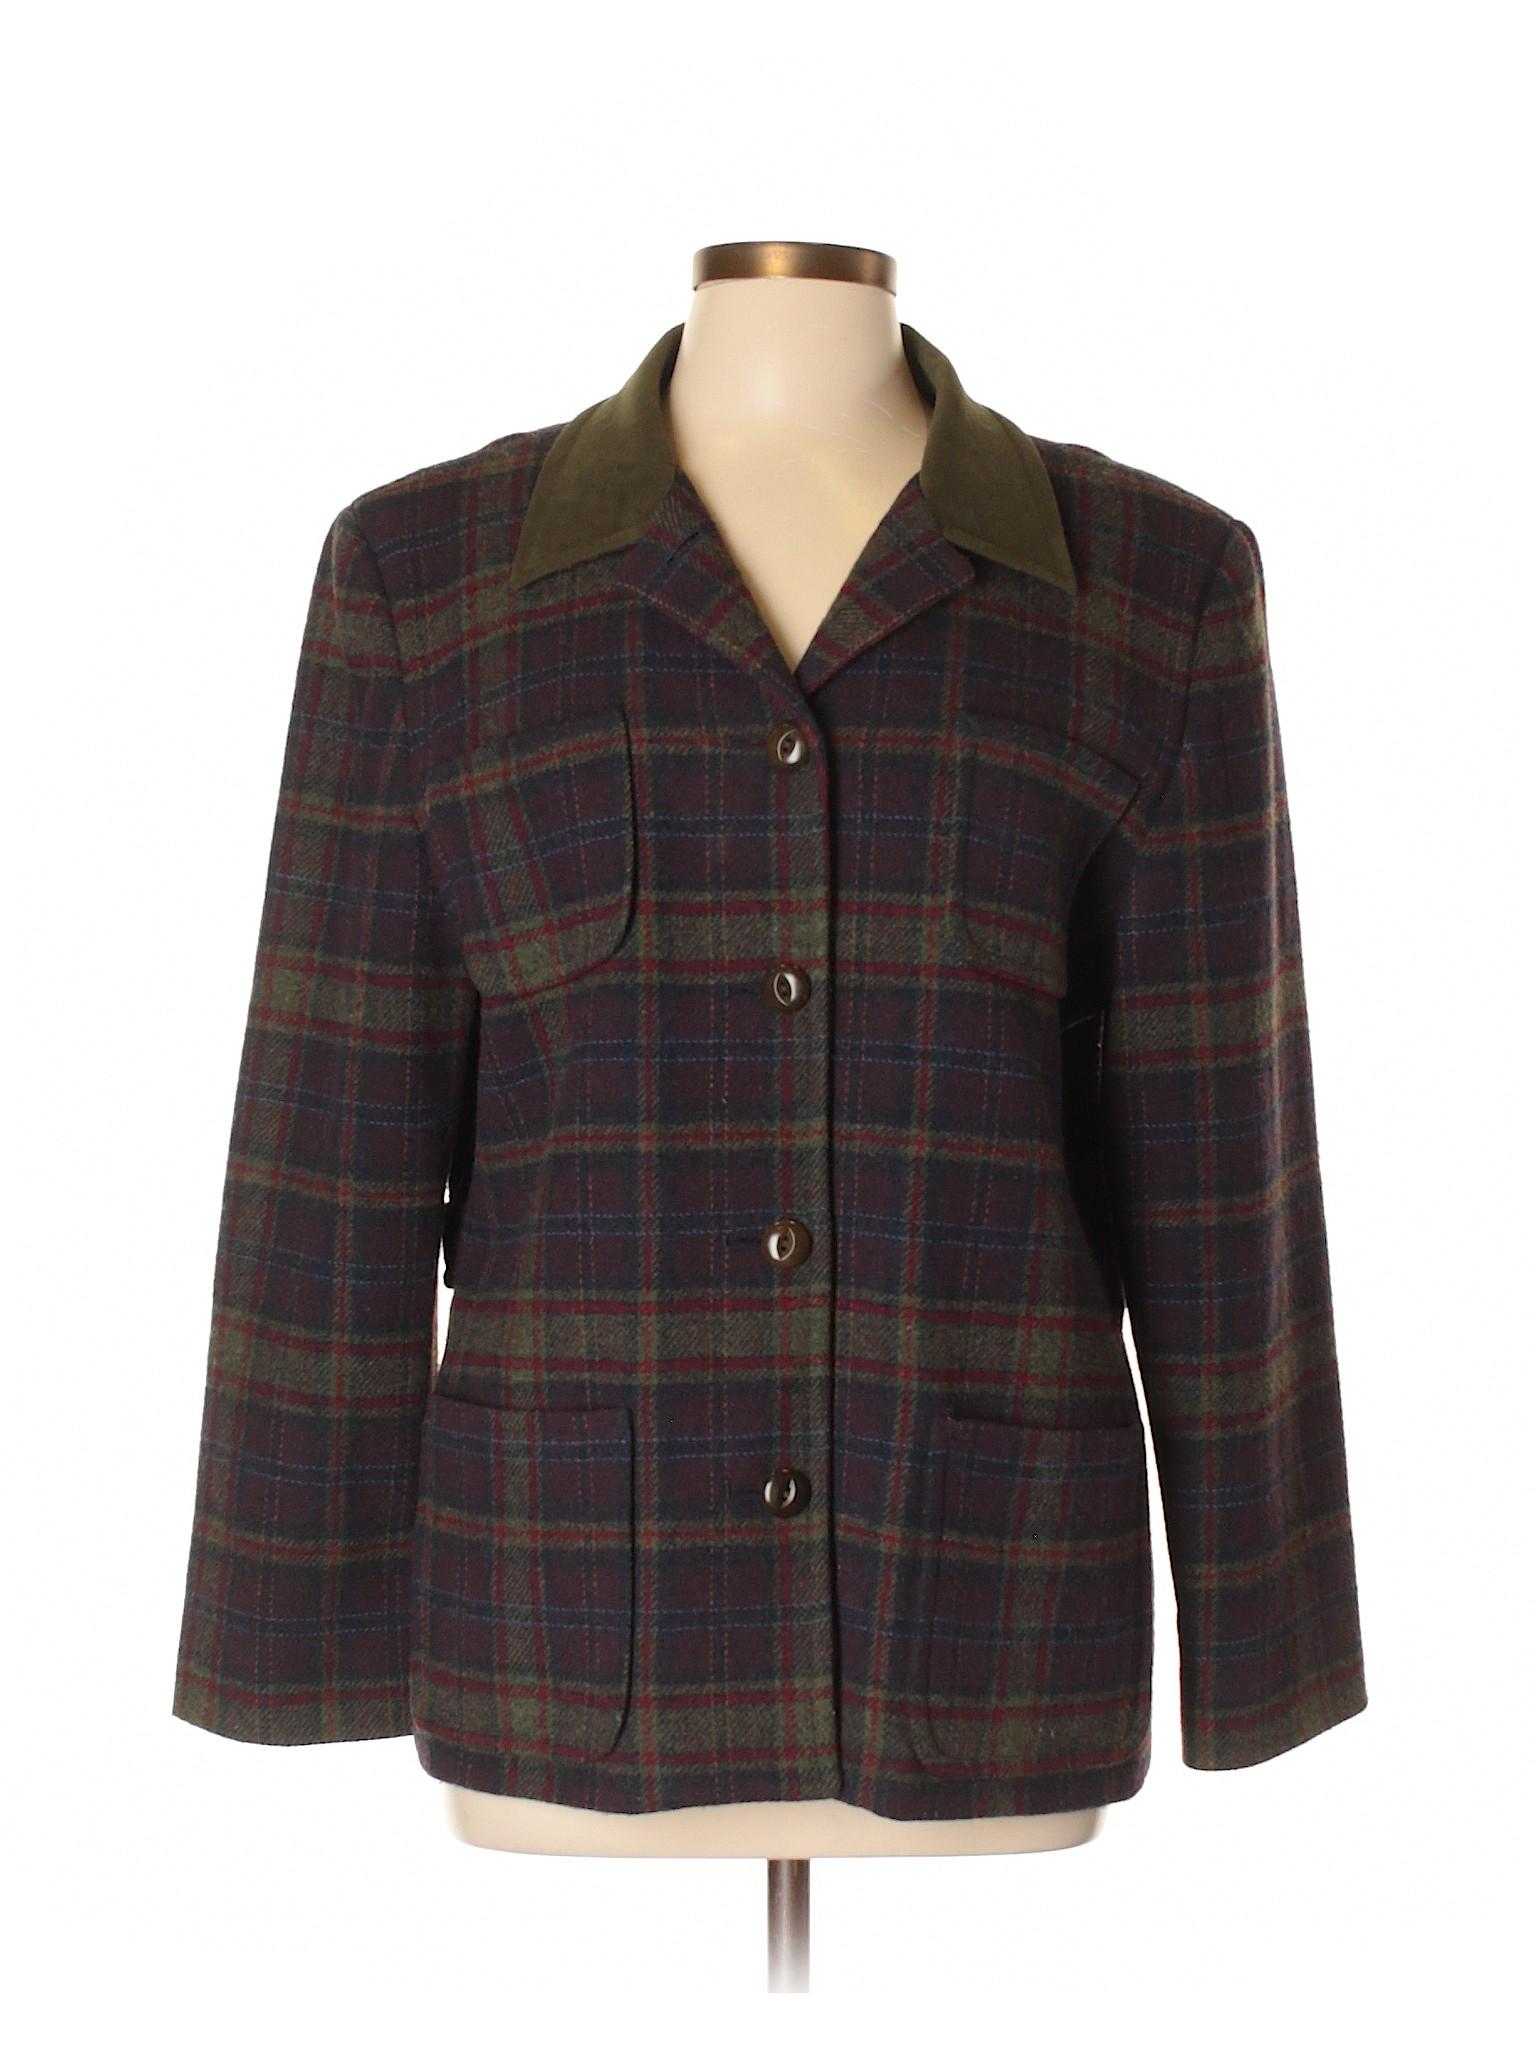 Winter Winter Pendleton Leisure Wool Pendleton Leisure Coat Wool 6Tw5fXqx